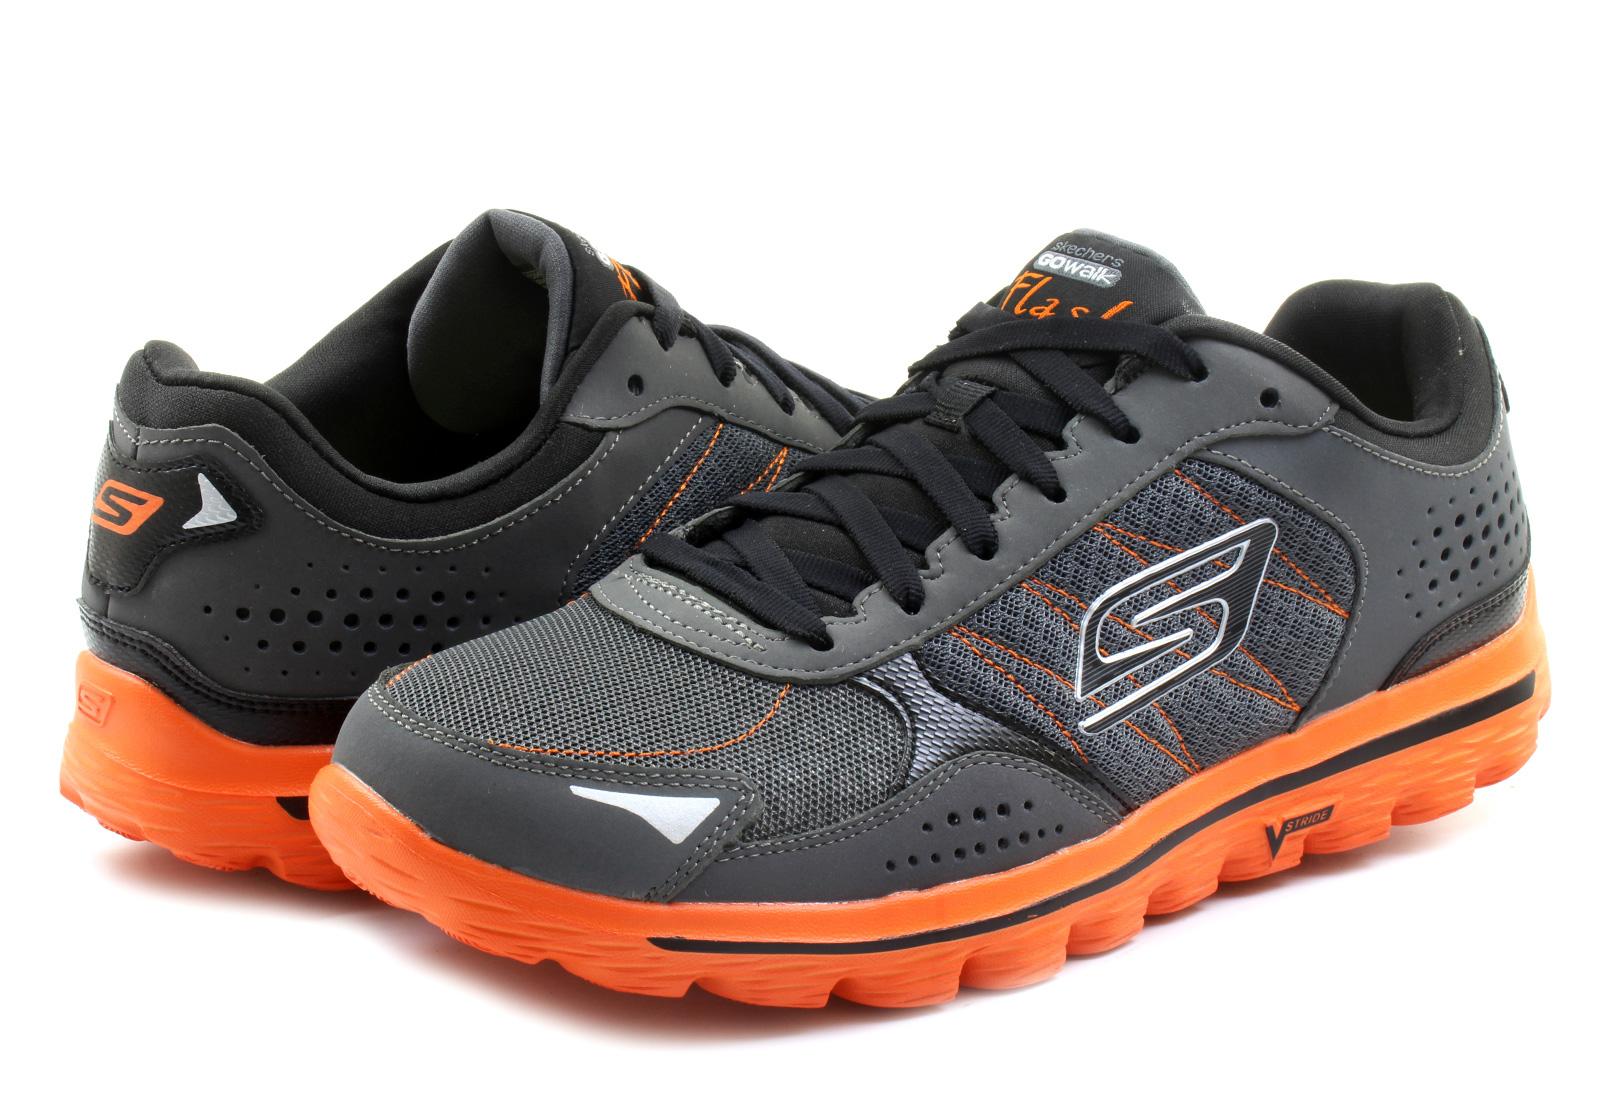 Skechers Topánky - Go Walk 2 - Flash - 53960-CCOR - Tenisky c6b39e9f75